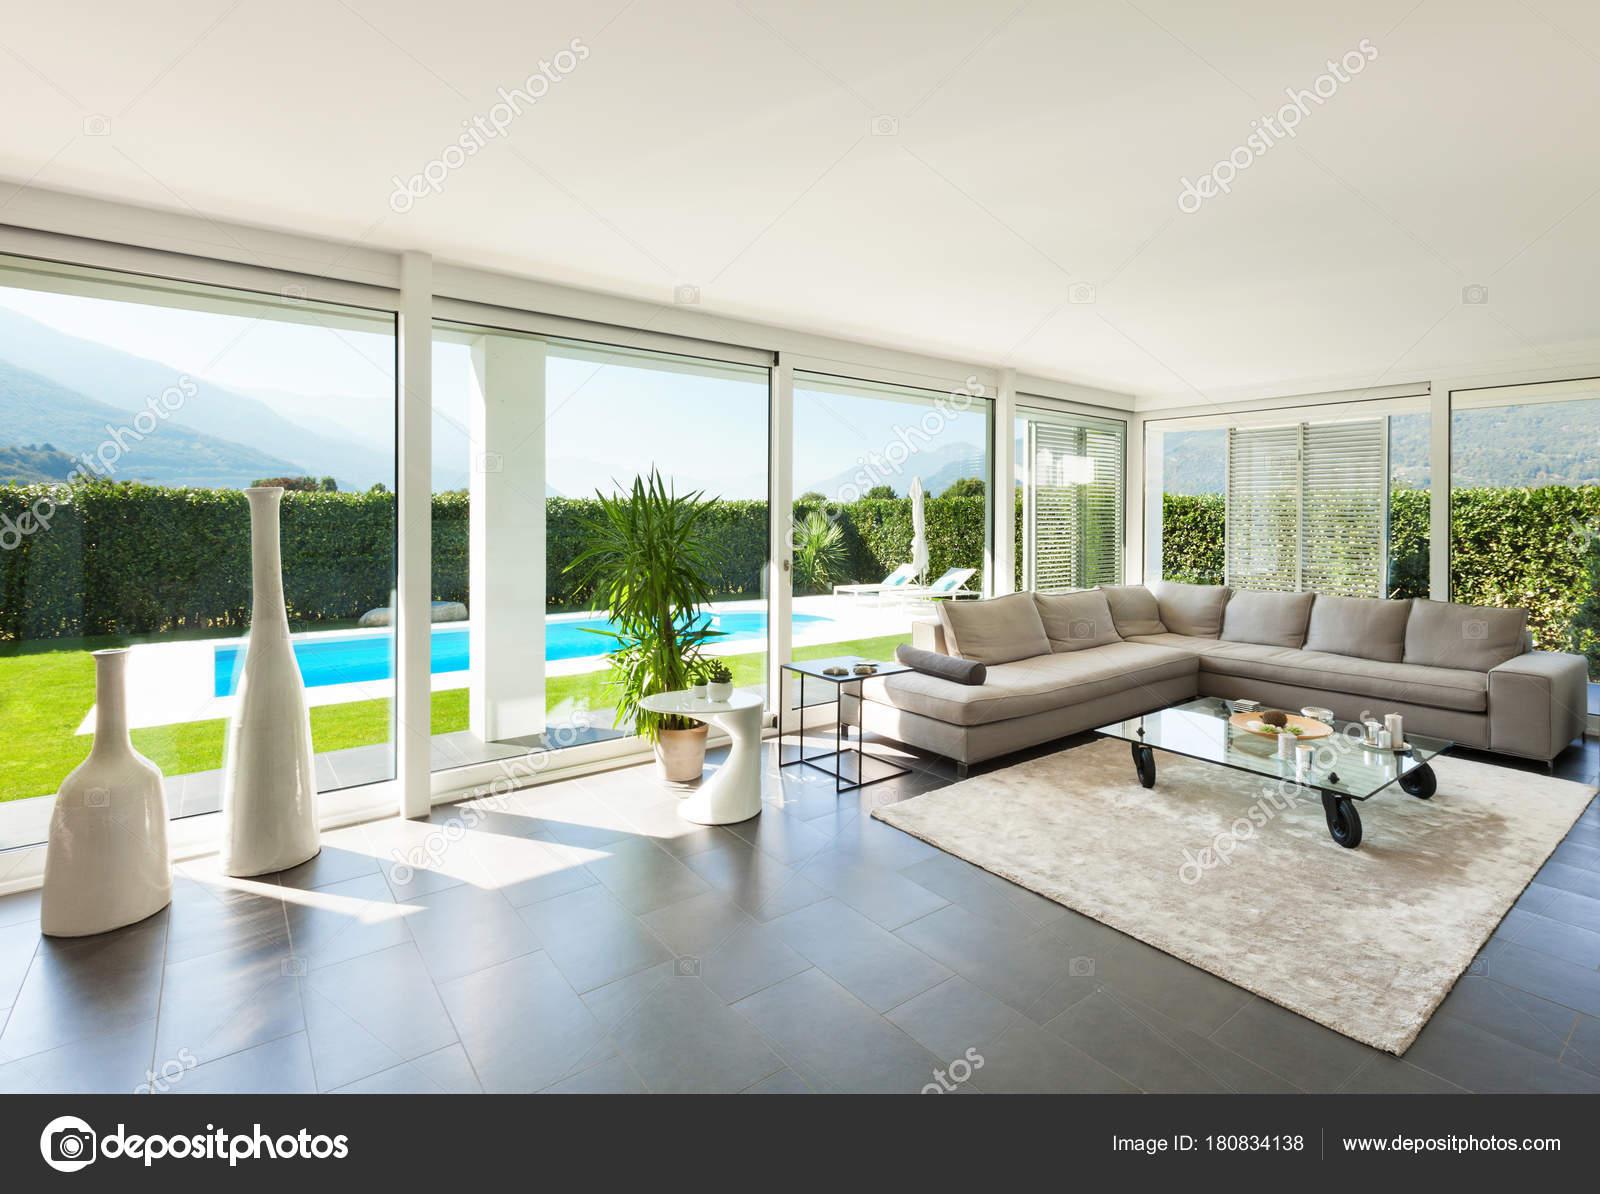 Casa moderna interni foto stock zveiger 180834138 for Arredamento interno casa moderna